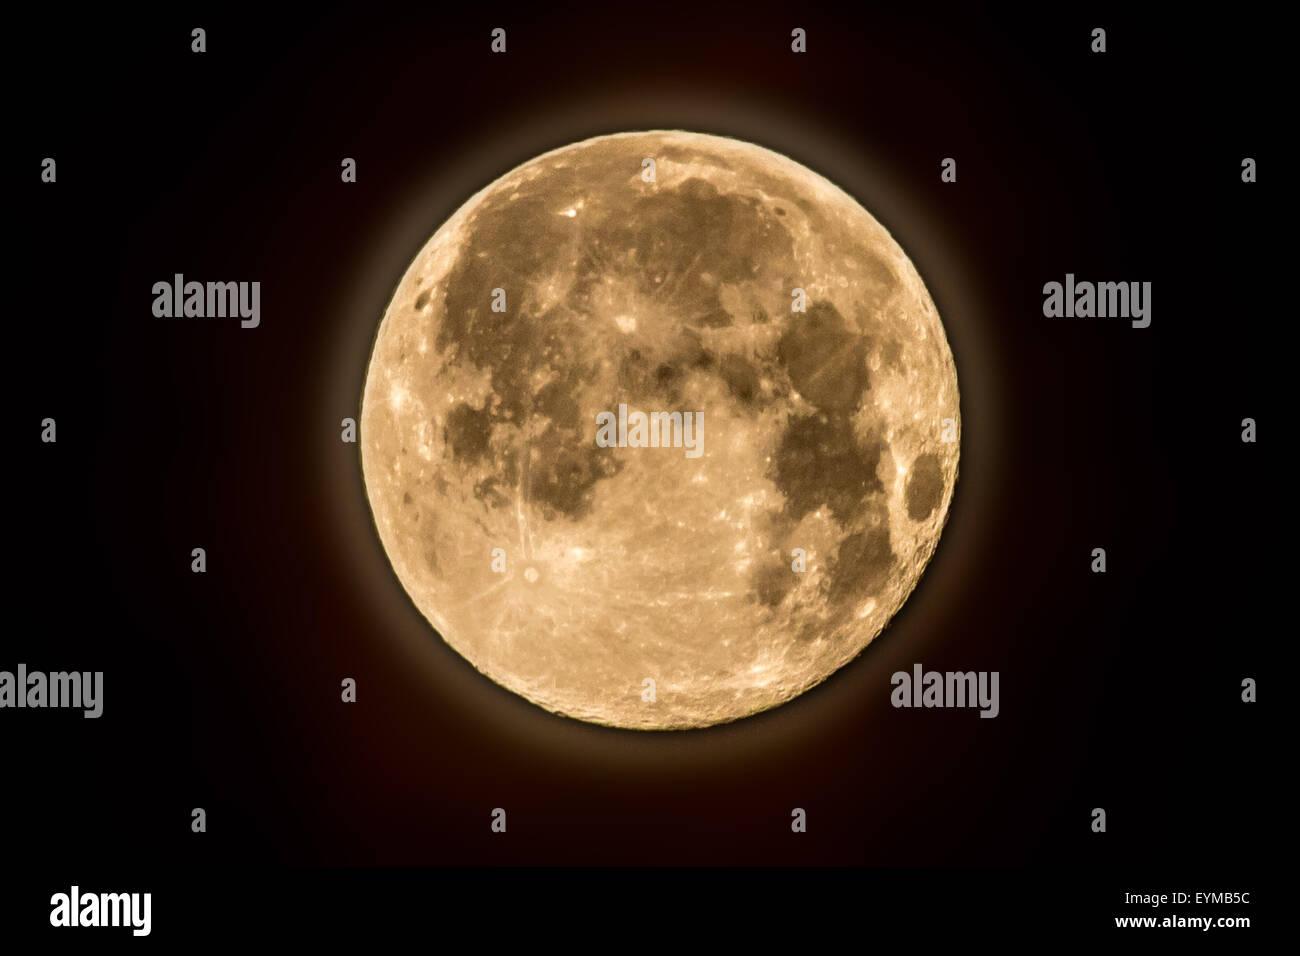 London Moon Stock Photos & London Moon Stock Images - Alamy